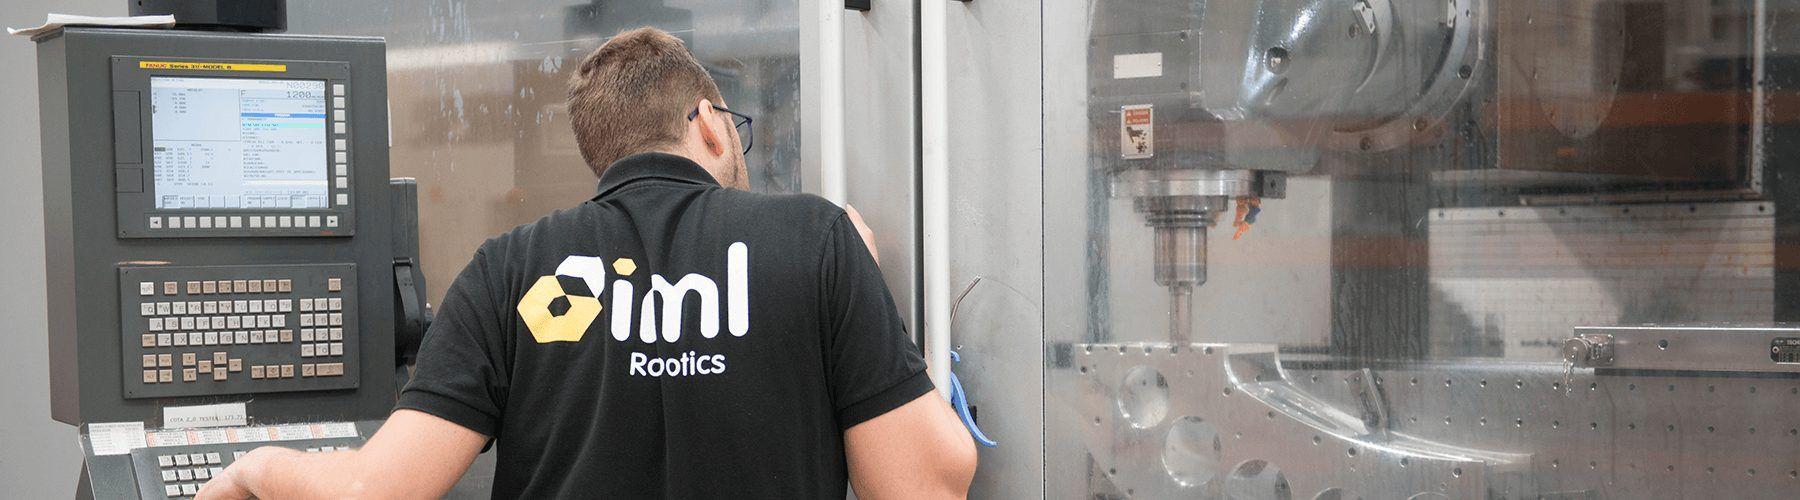 Side-entry IML Robot